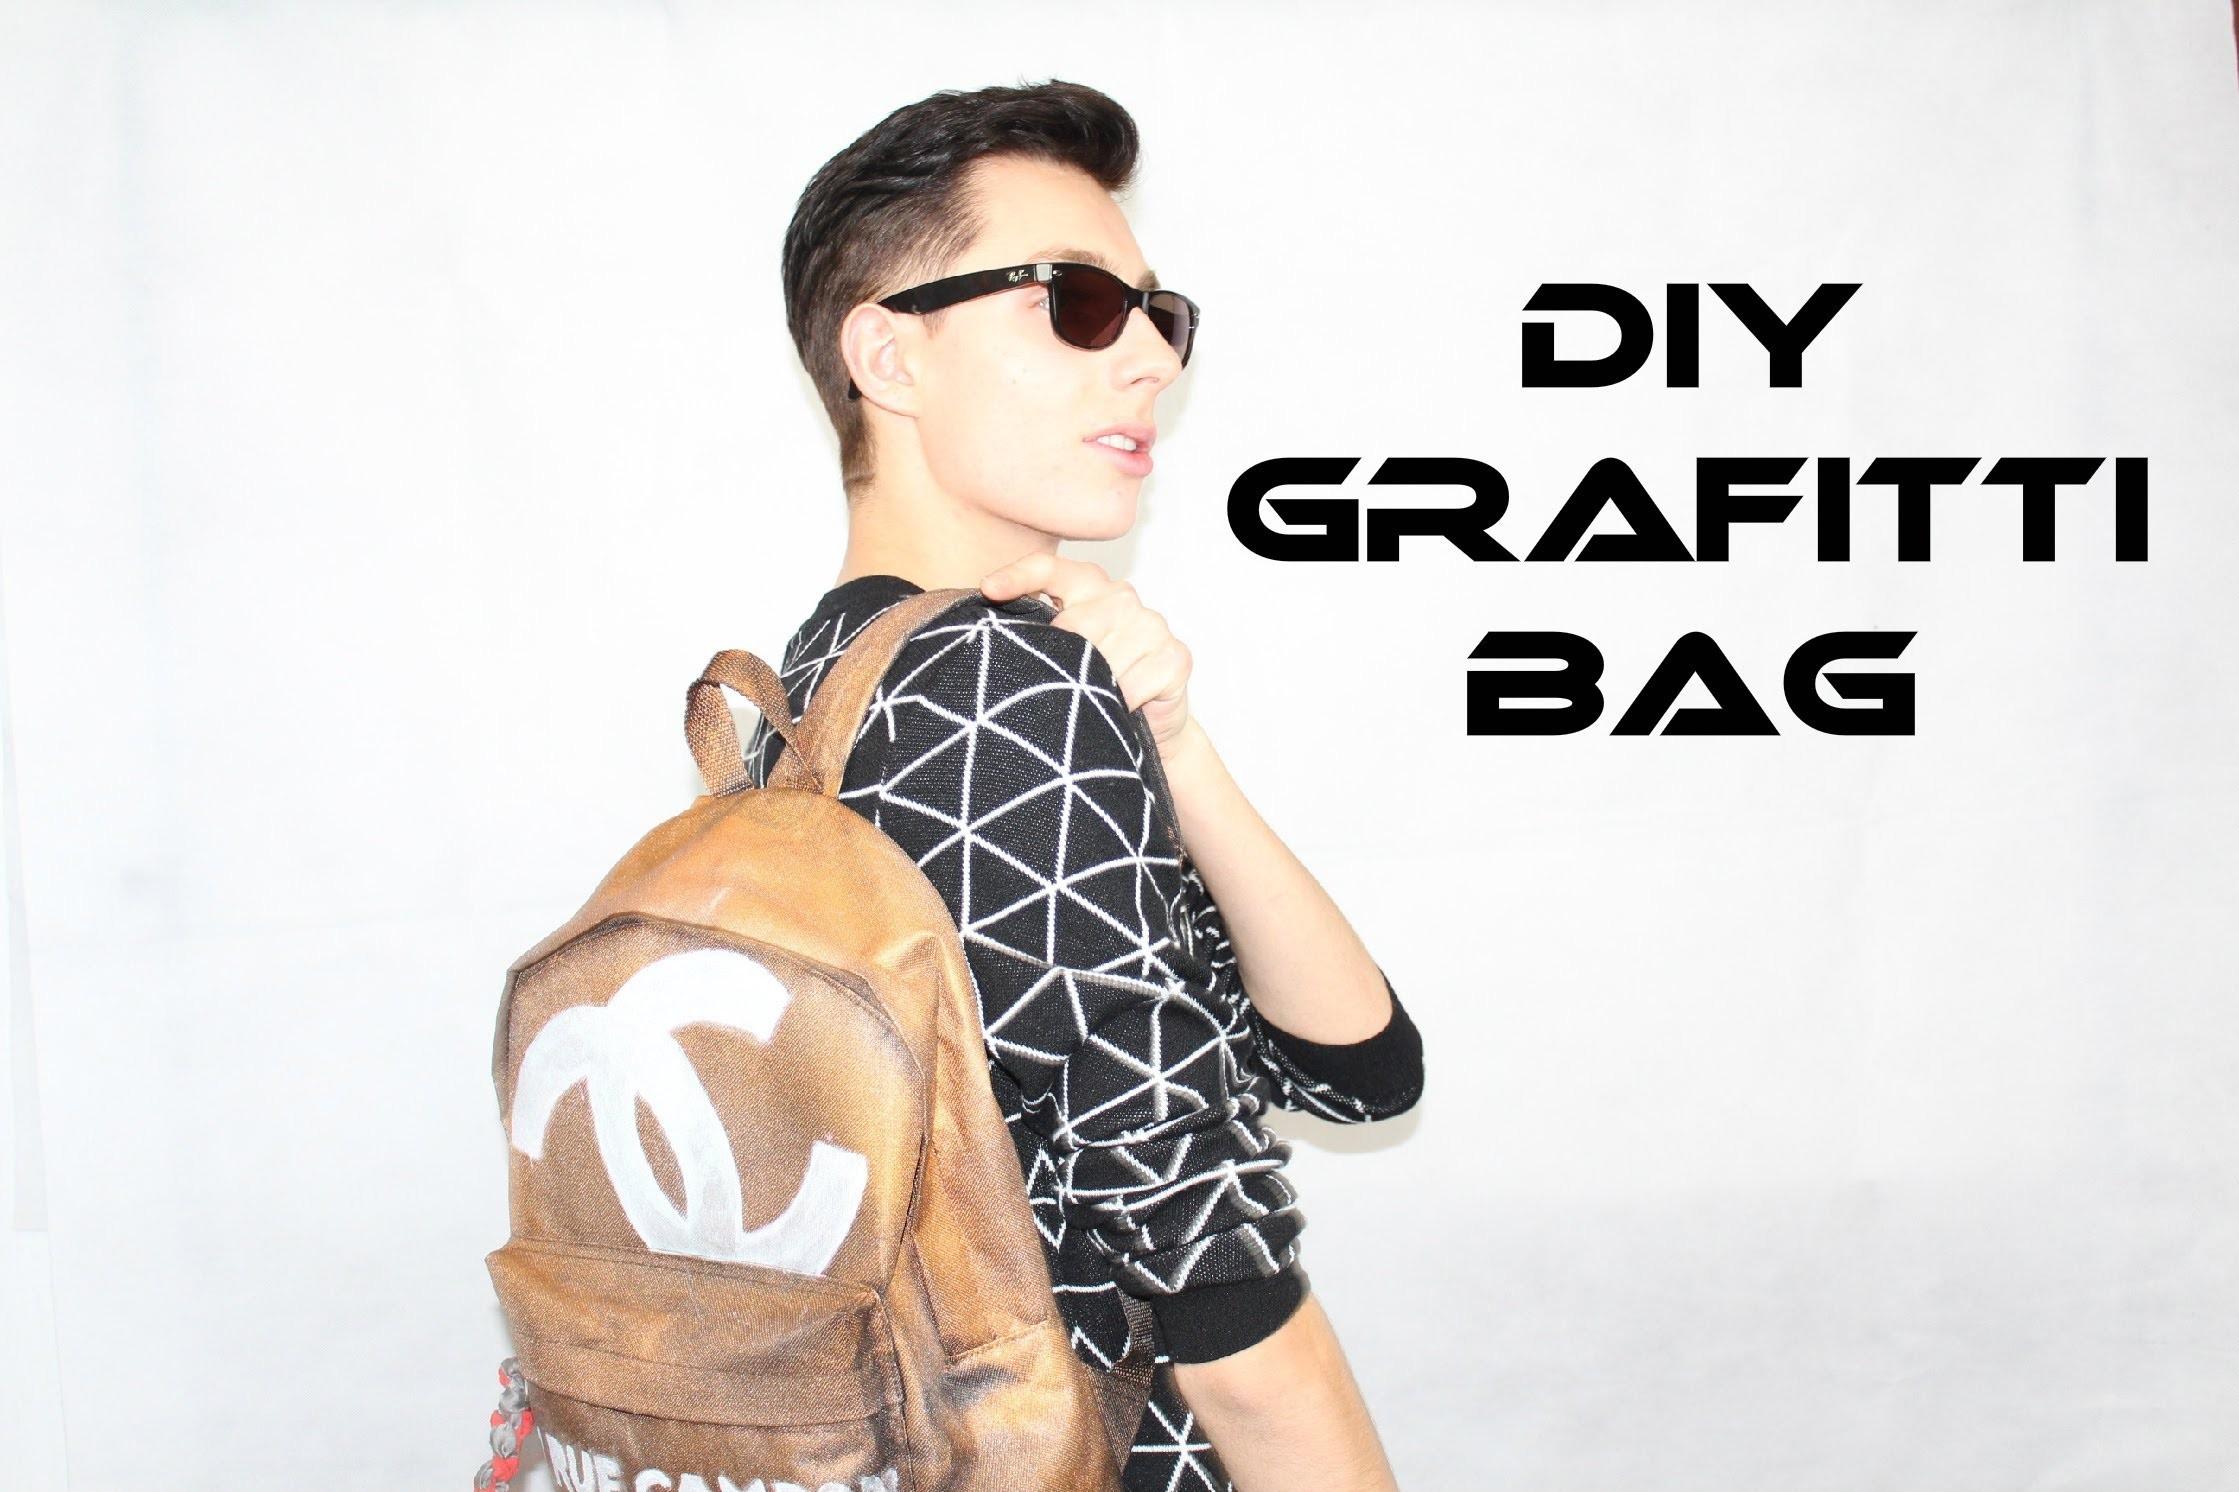 CHANEL INSPIRED GRAFITTI BAG! Fashion DIY Part 2